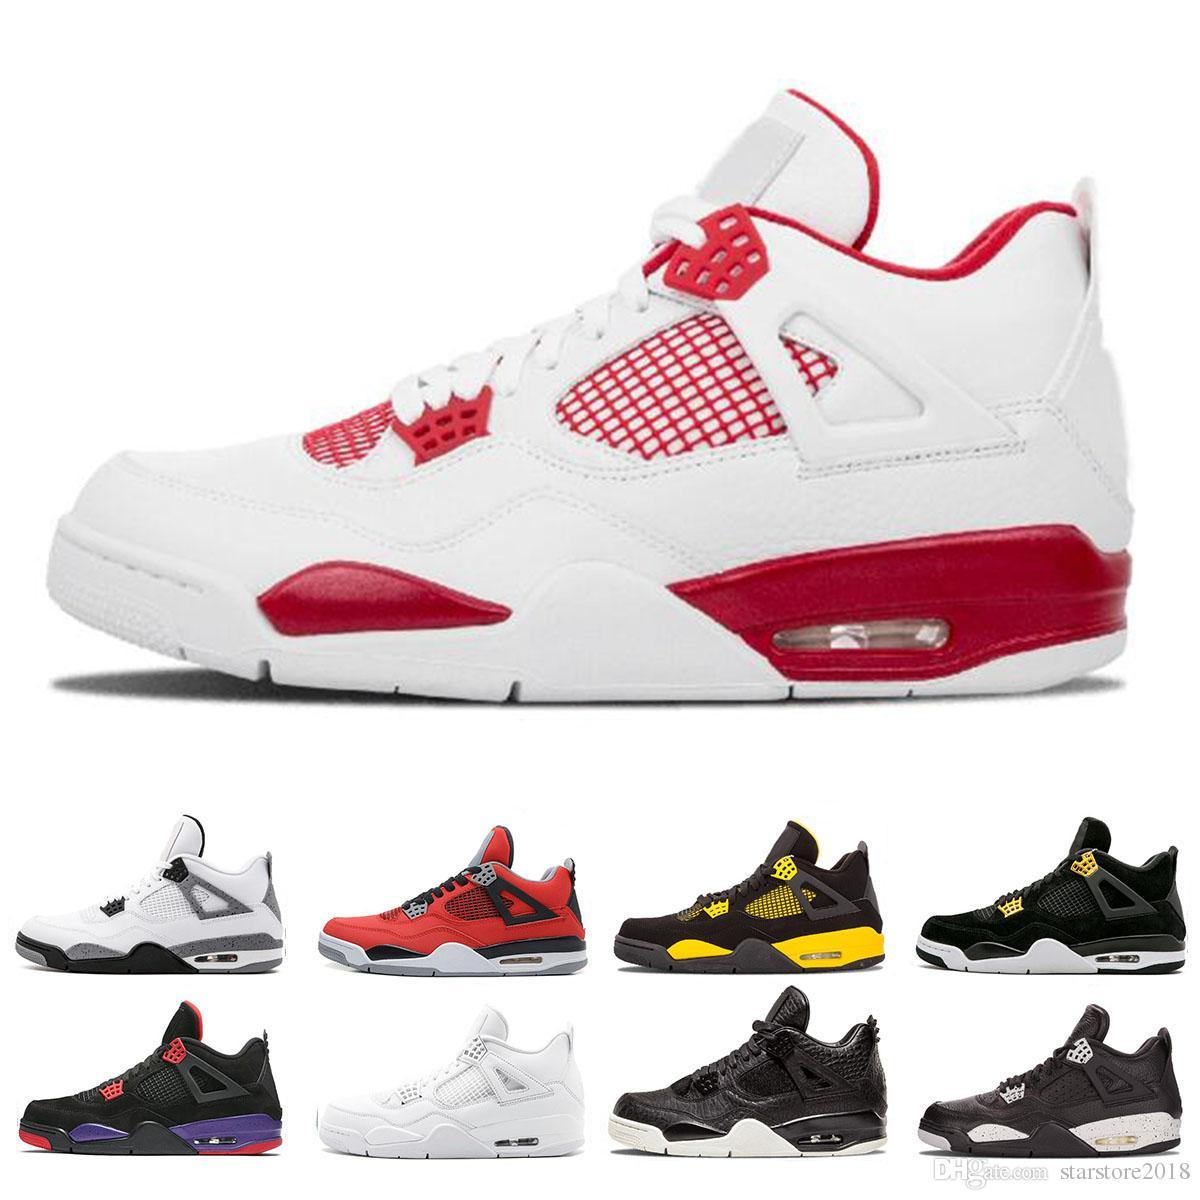 a0dcc7b5d5e Nike Air Jordan 4 4s Populares 4 4s Realeza Hombres Zapatos De Baloncesto  Zapatillas De Deporte Día Solo Tatuaje Raptors New Men Alternate Motorsport  White ...